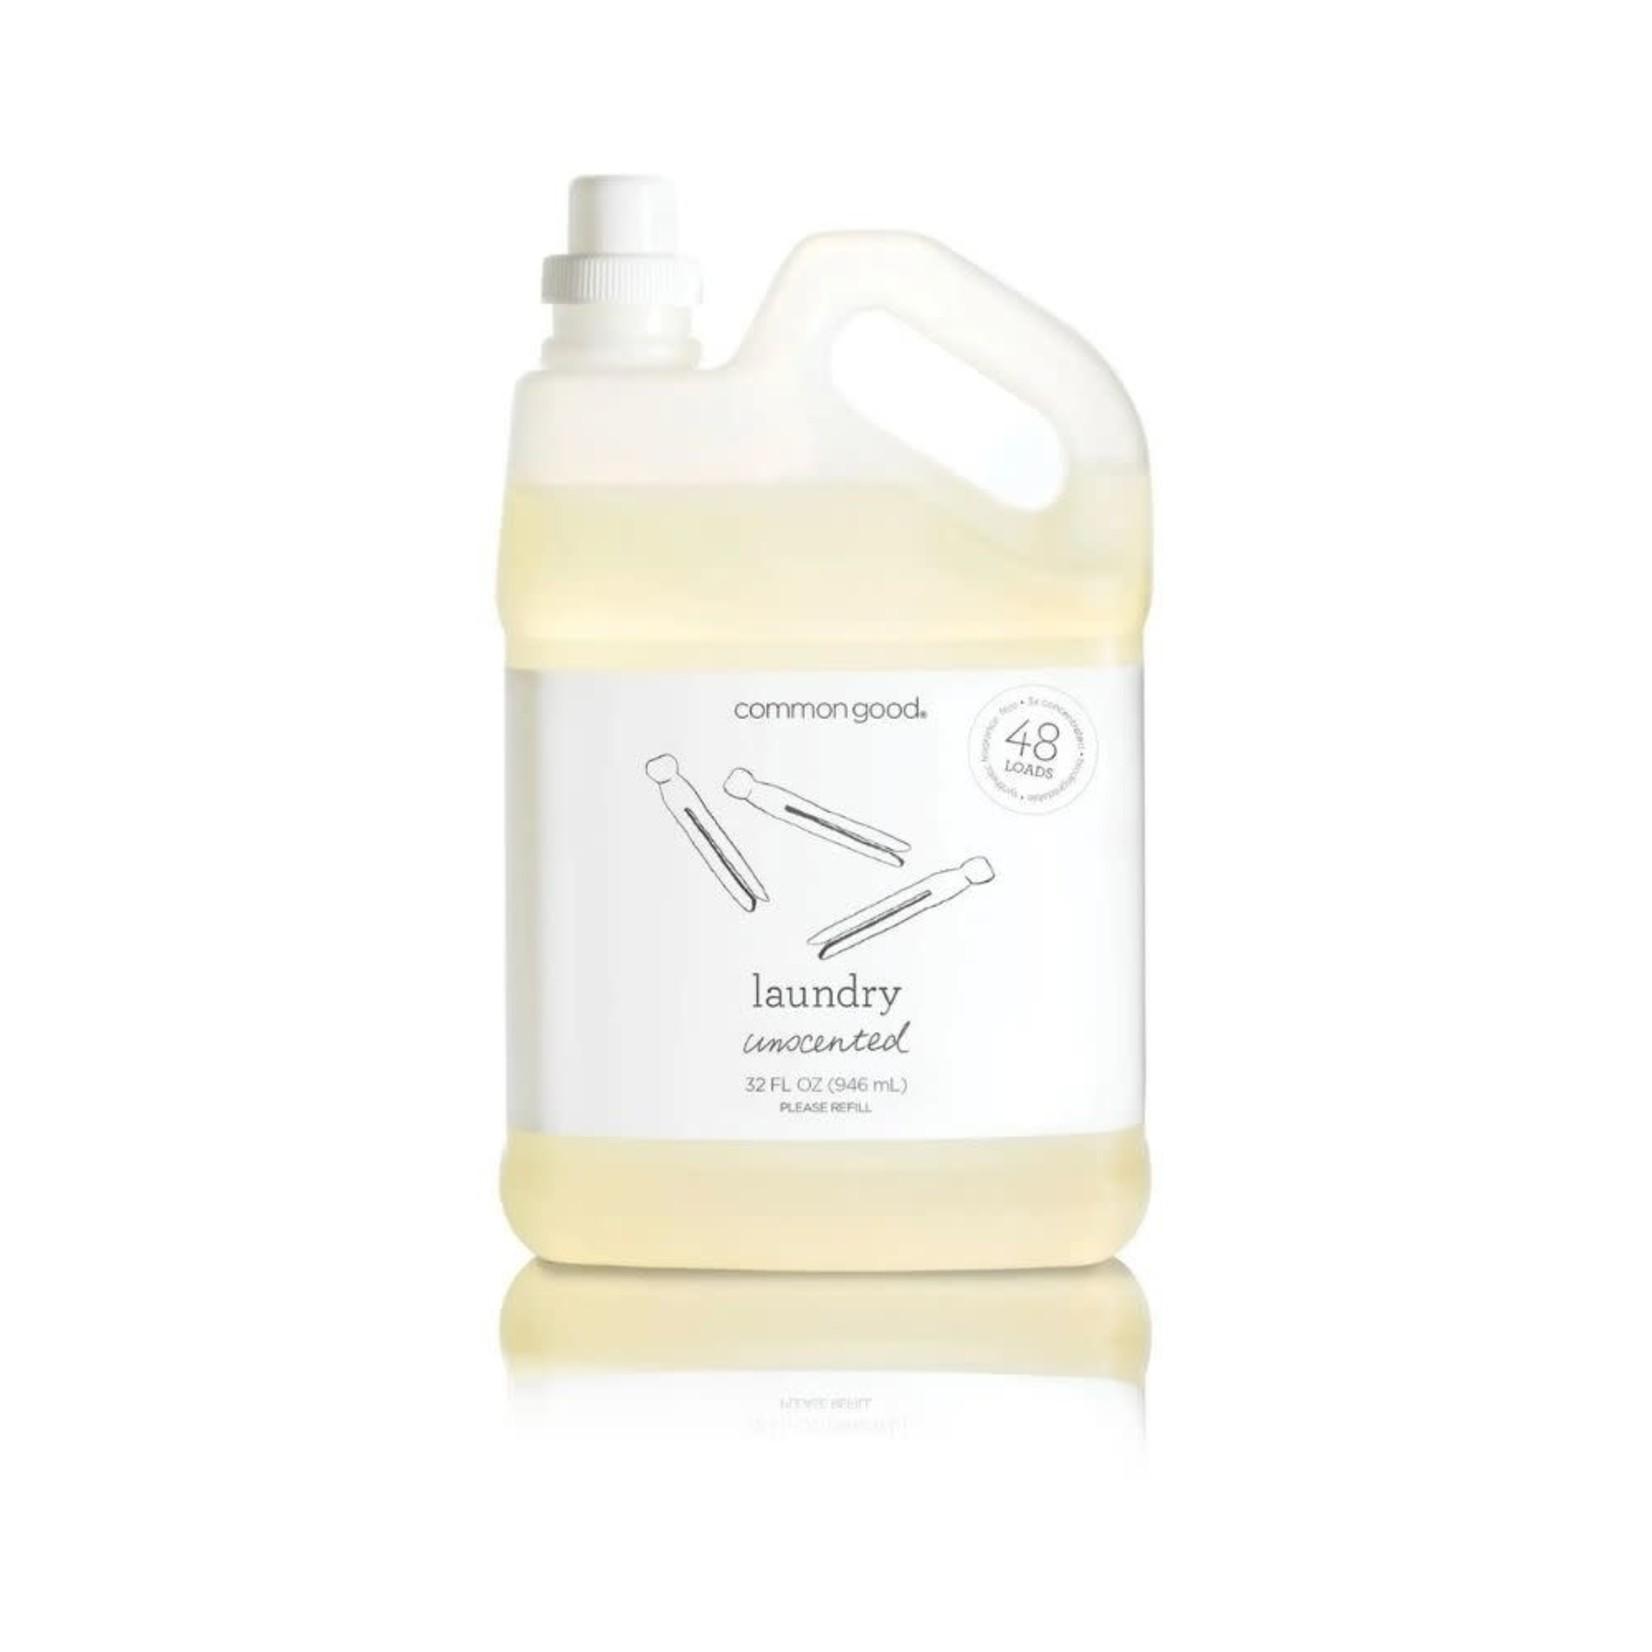 Unscented Laundry Detergent 32 oz